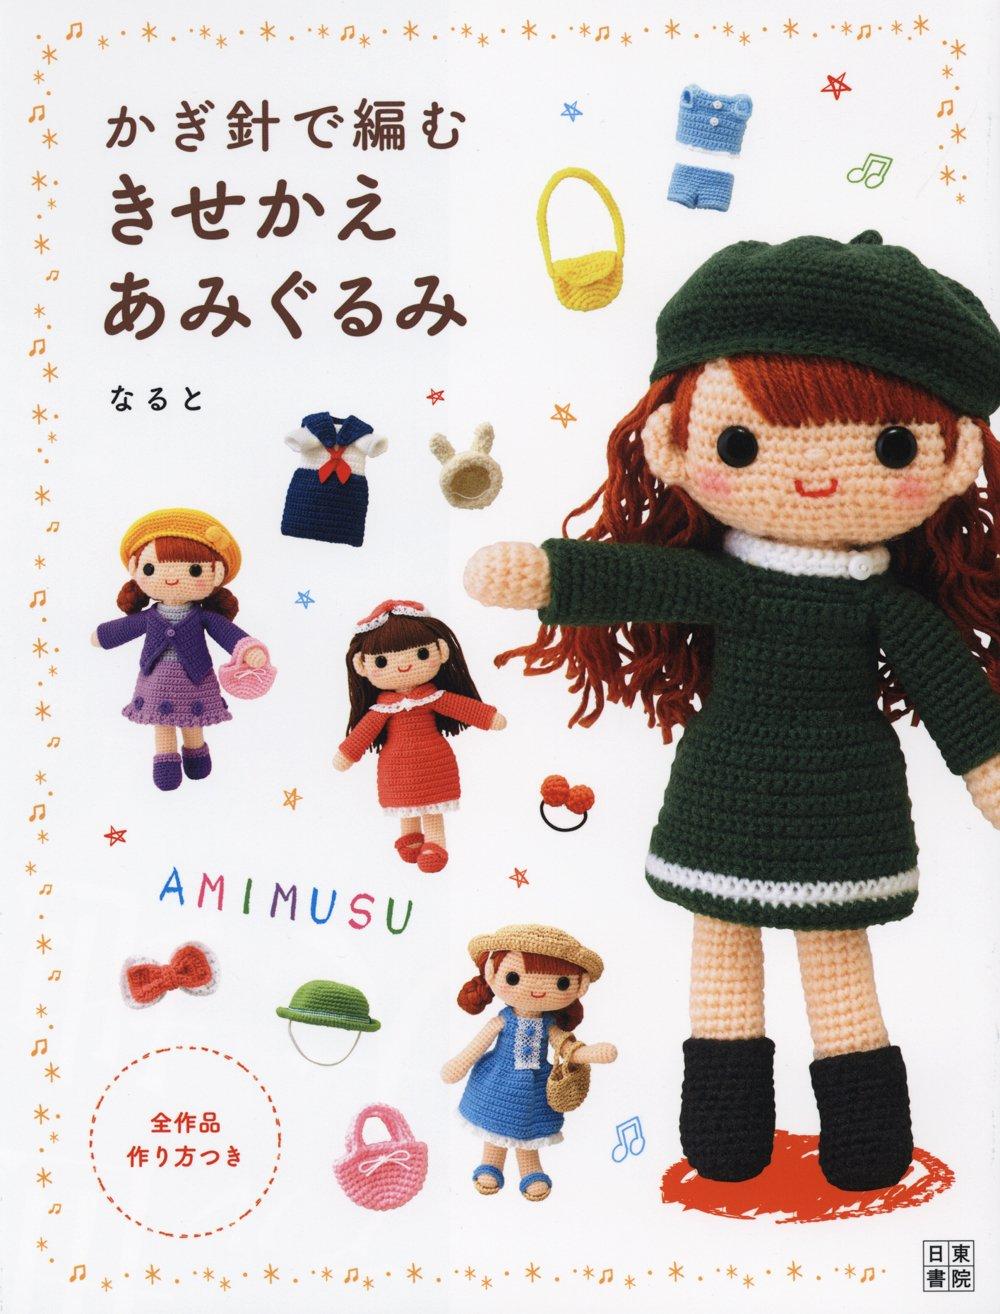 Knitting with Crochet Kisekaea Migurumi